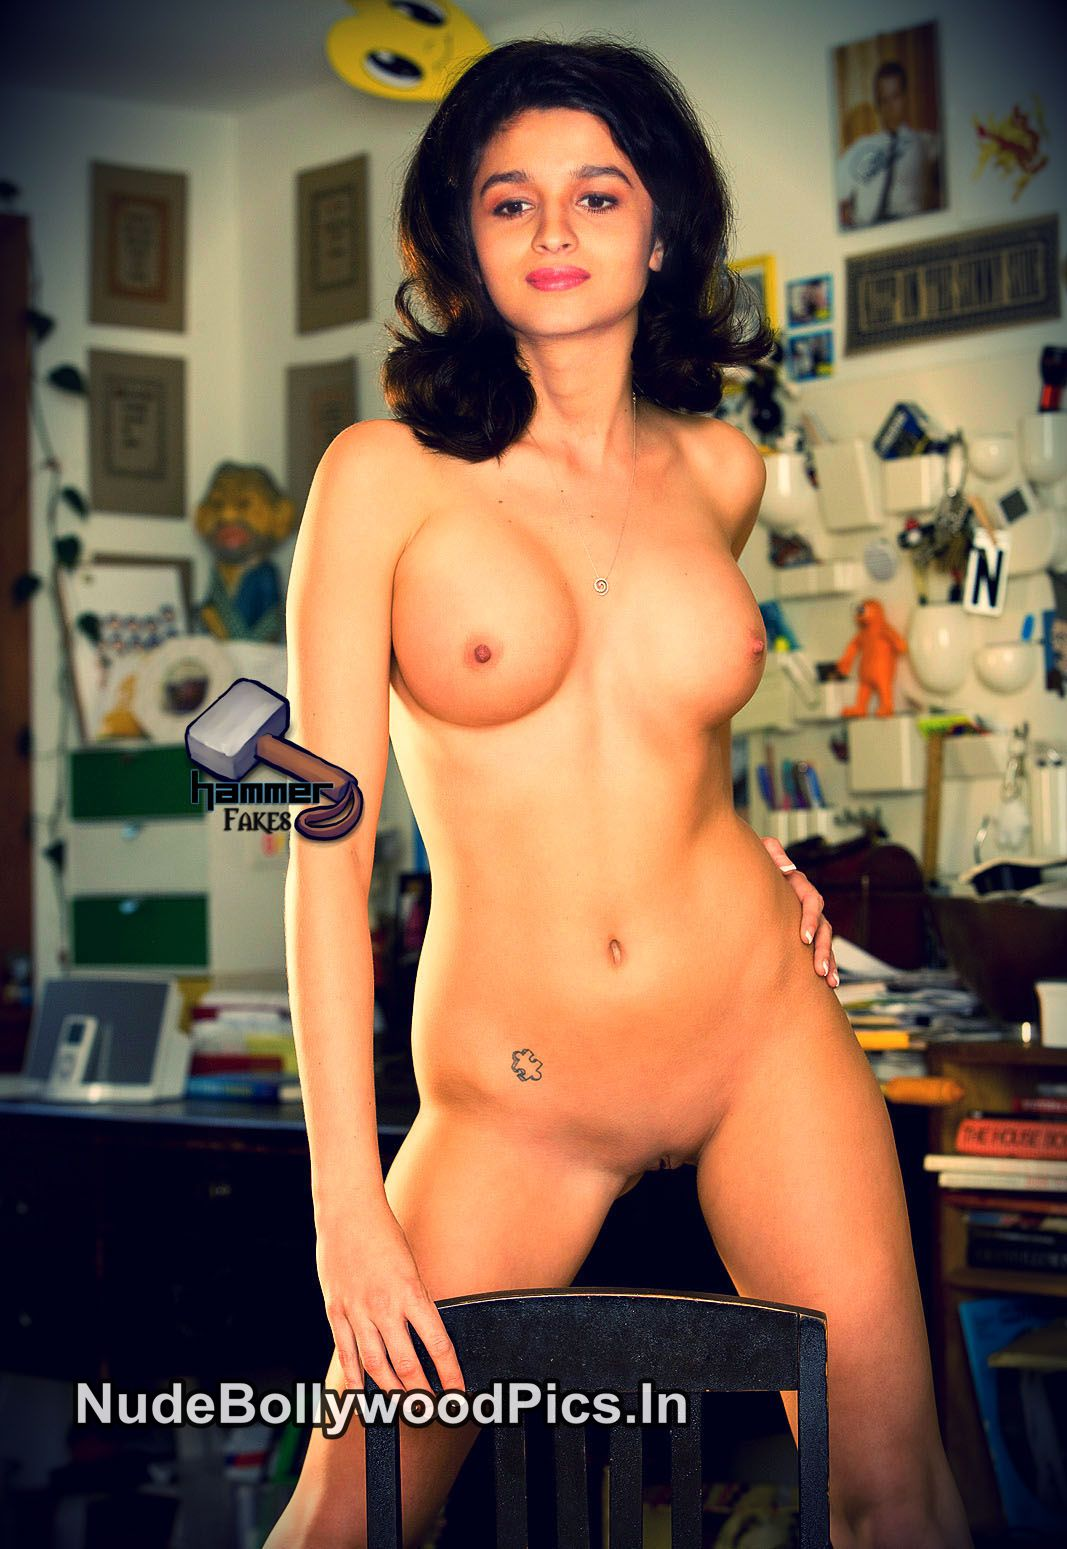 Pooja bhat nude fake pics #7